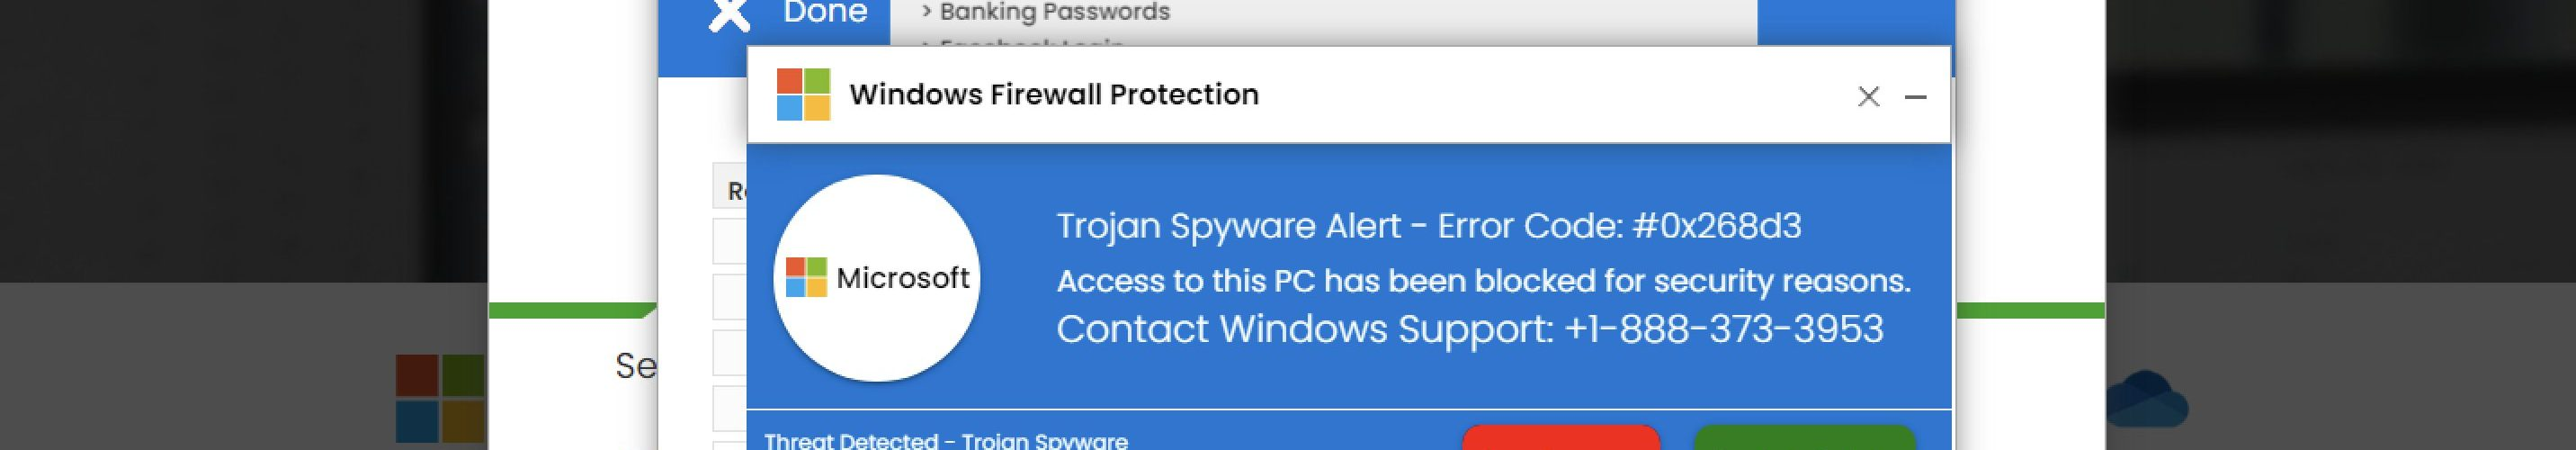 Trojan Spyware Alert - Error Code: #0x268d3